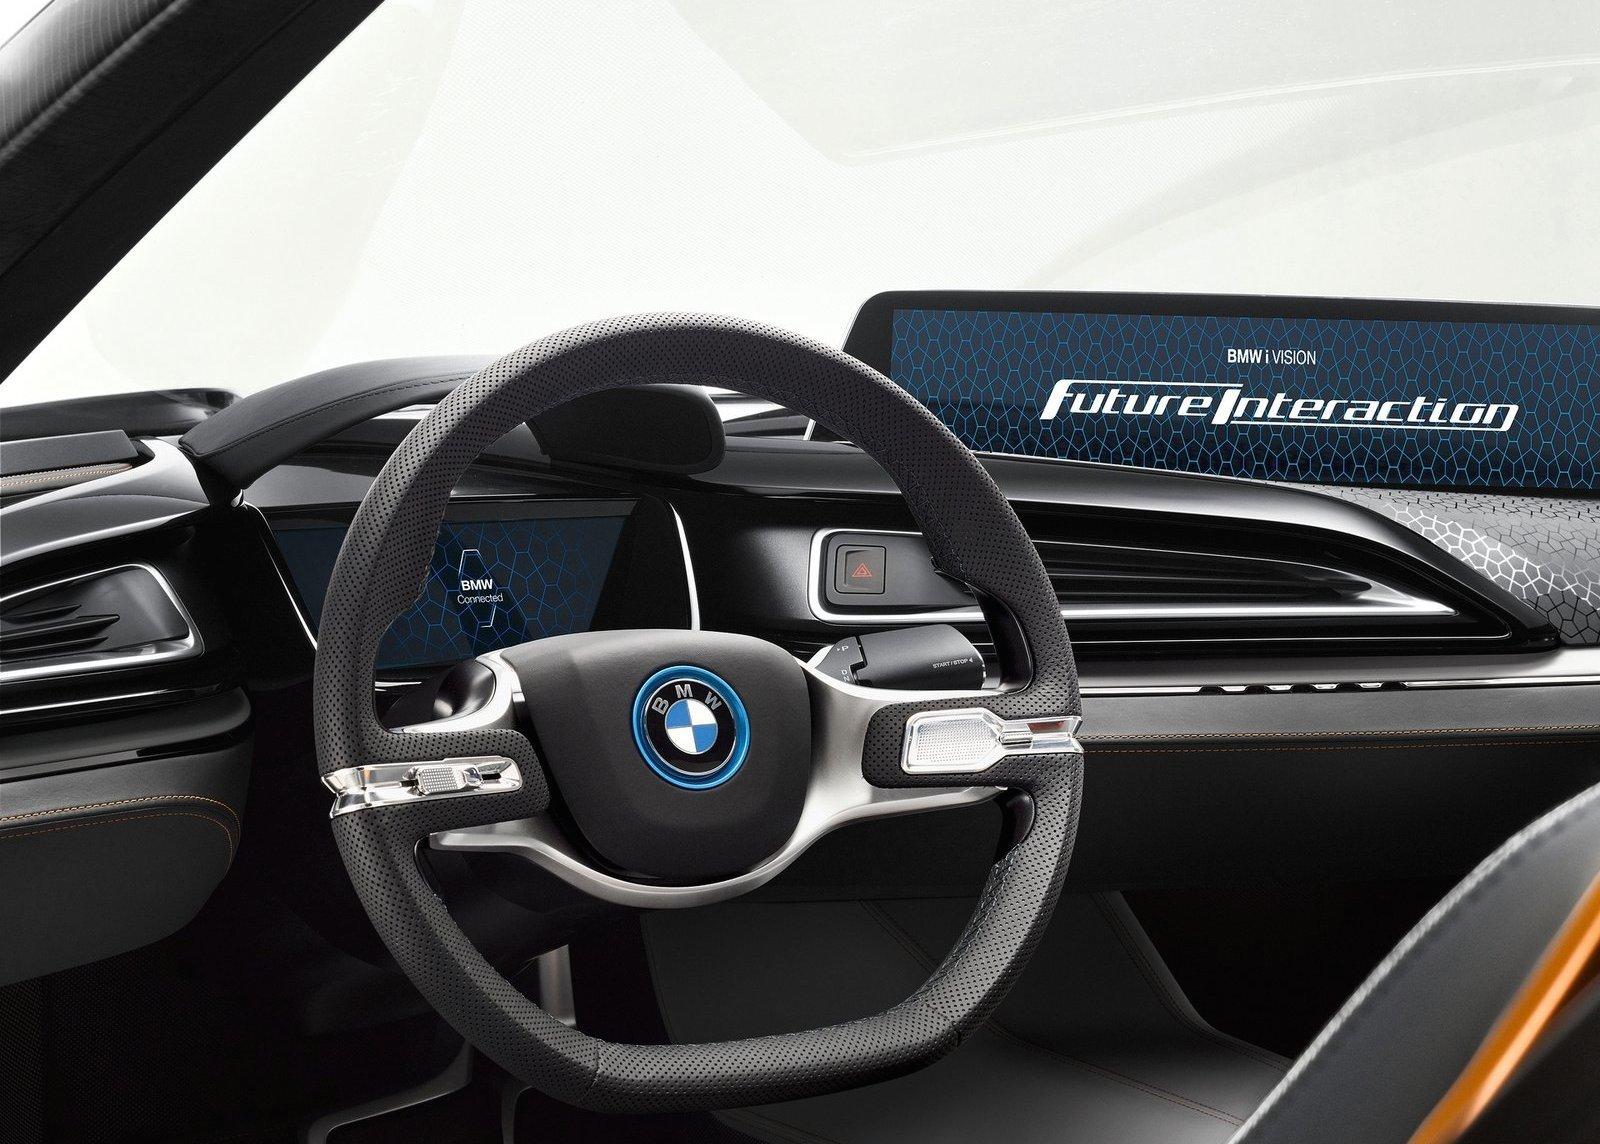 Foto de BMW i Vision Future Interaction Concept (7/19)